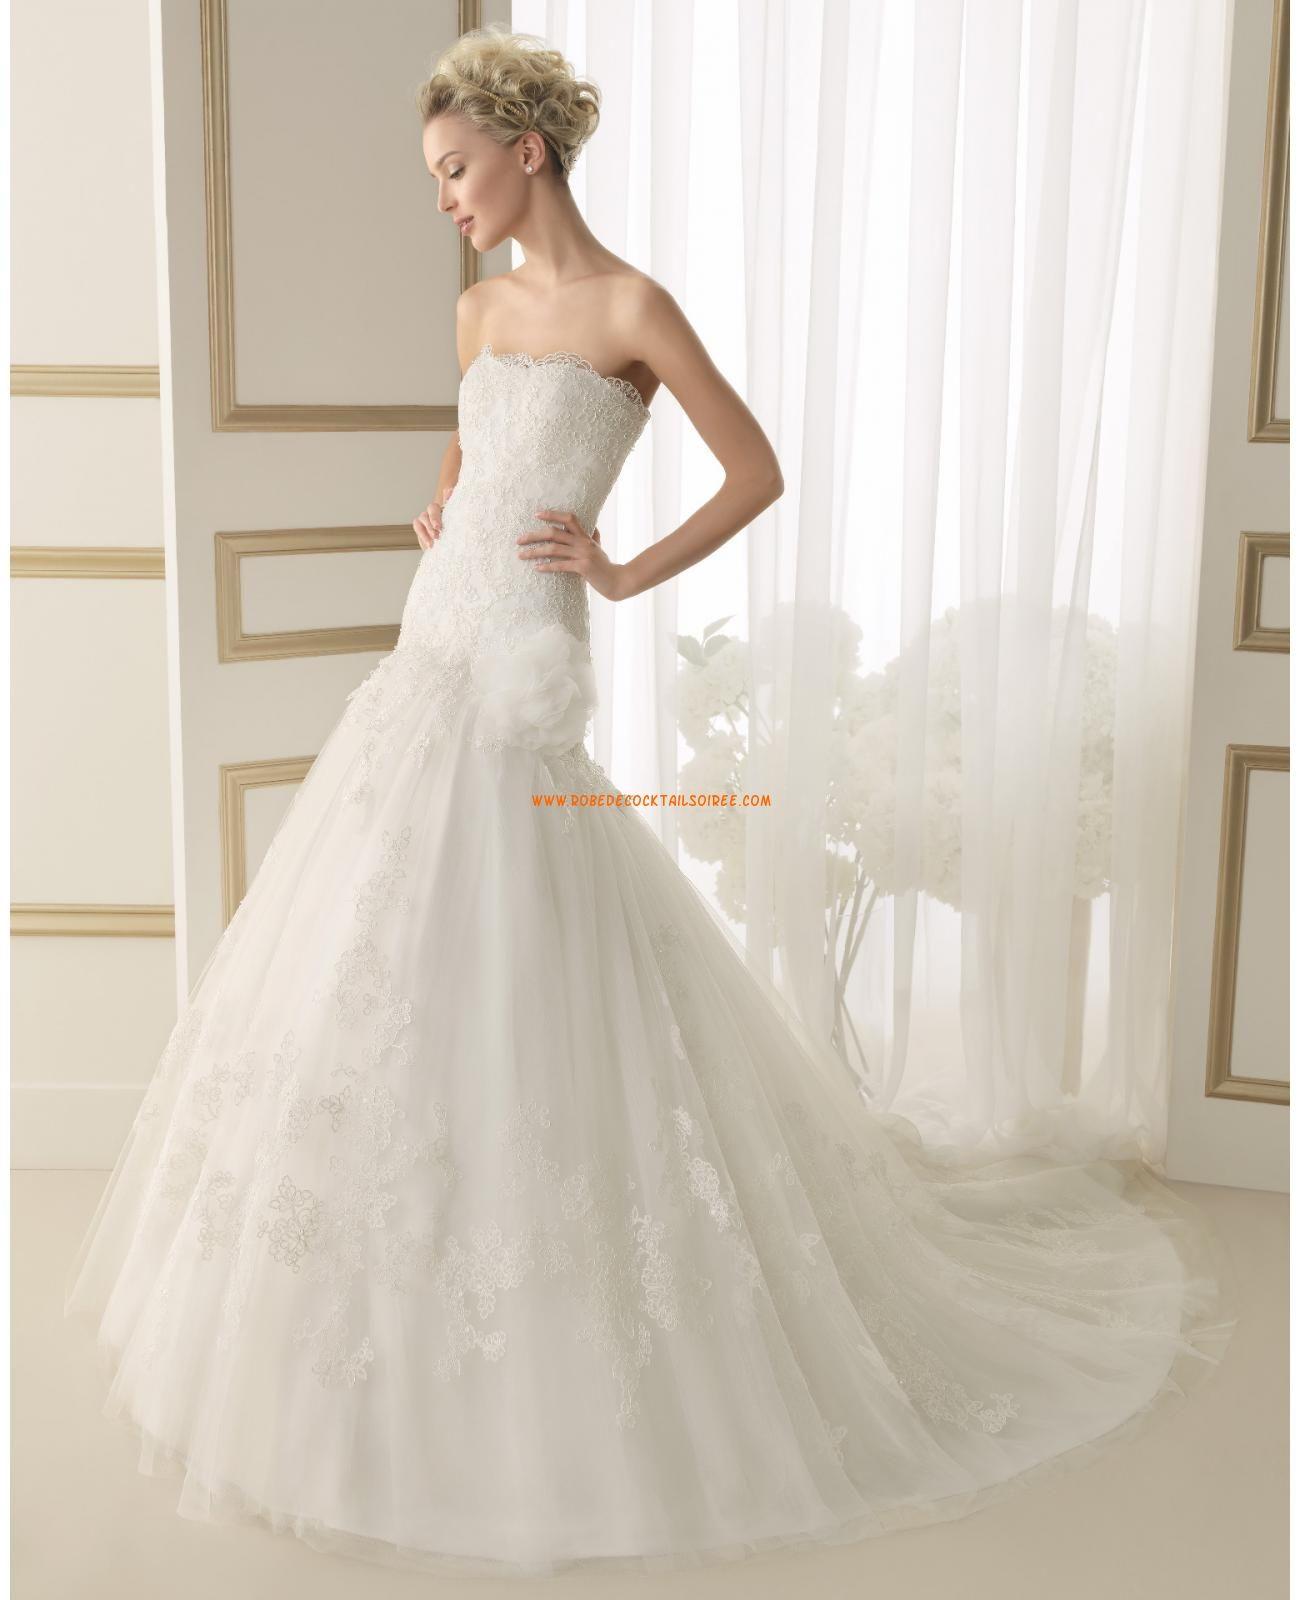 Fleur wedding dress  Robe de marie glamour tulle dentelle fleur  organza wedding dresses